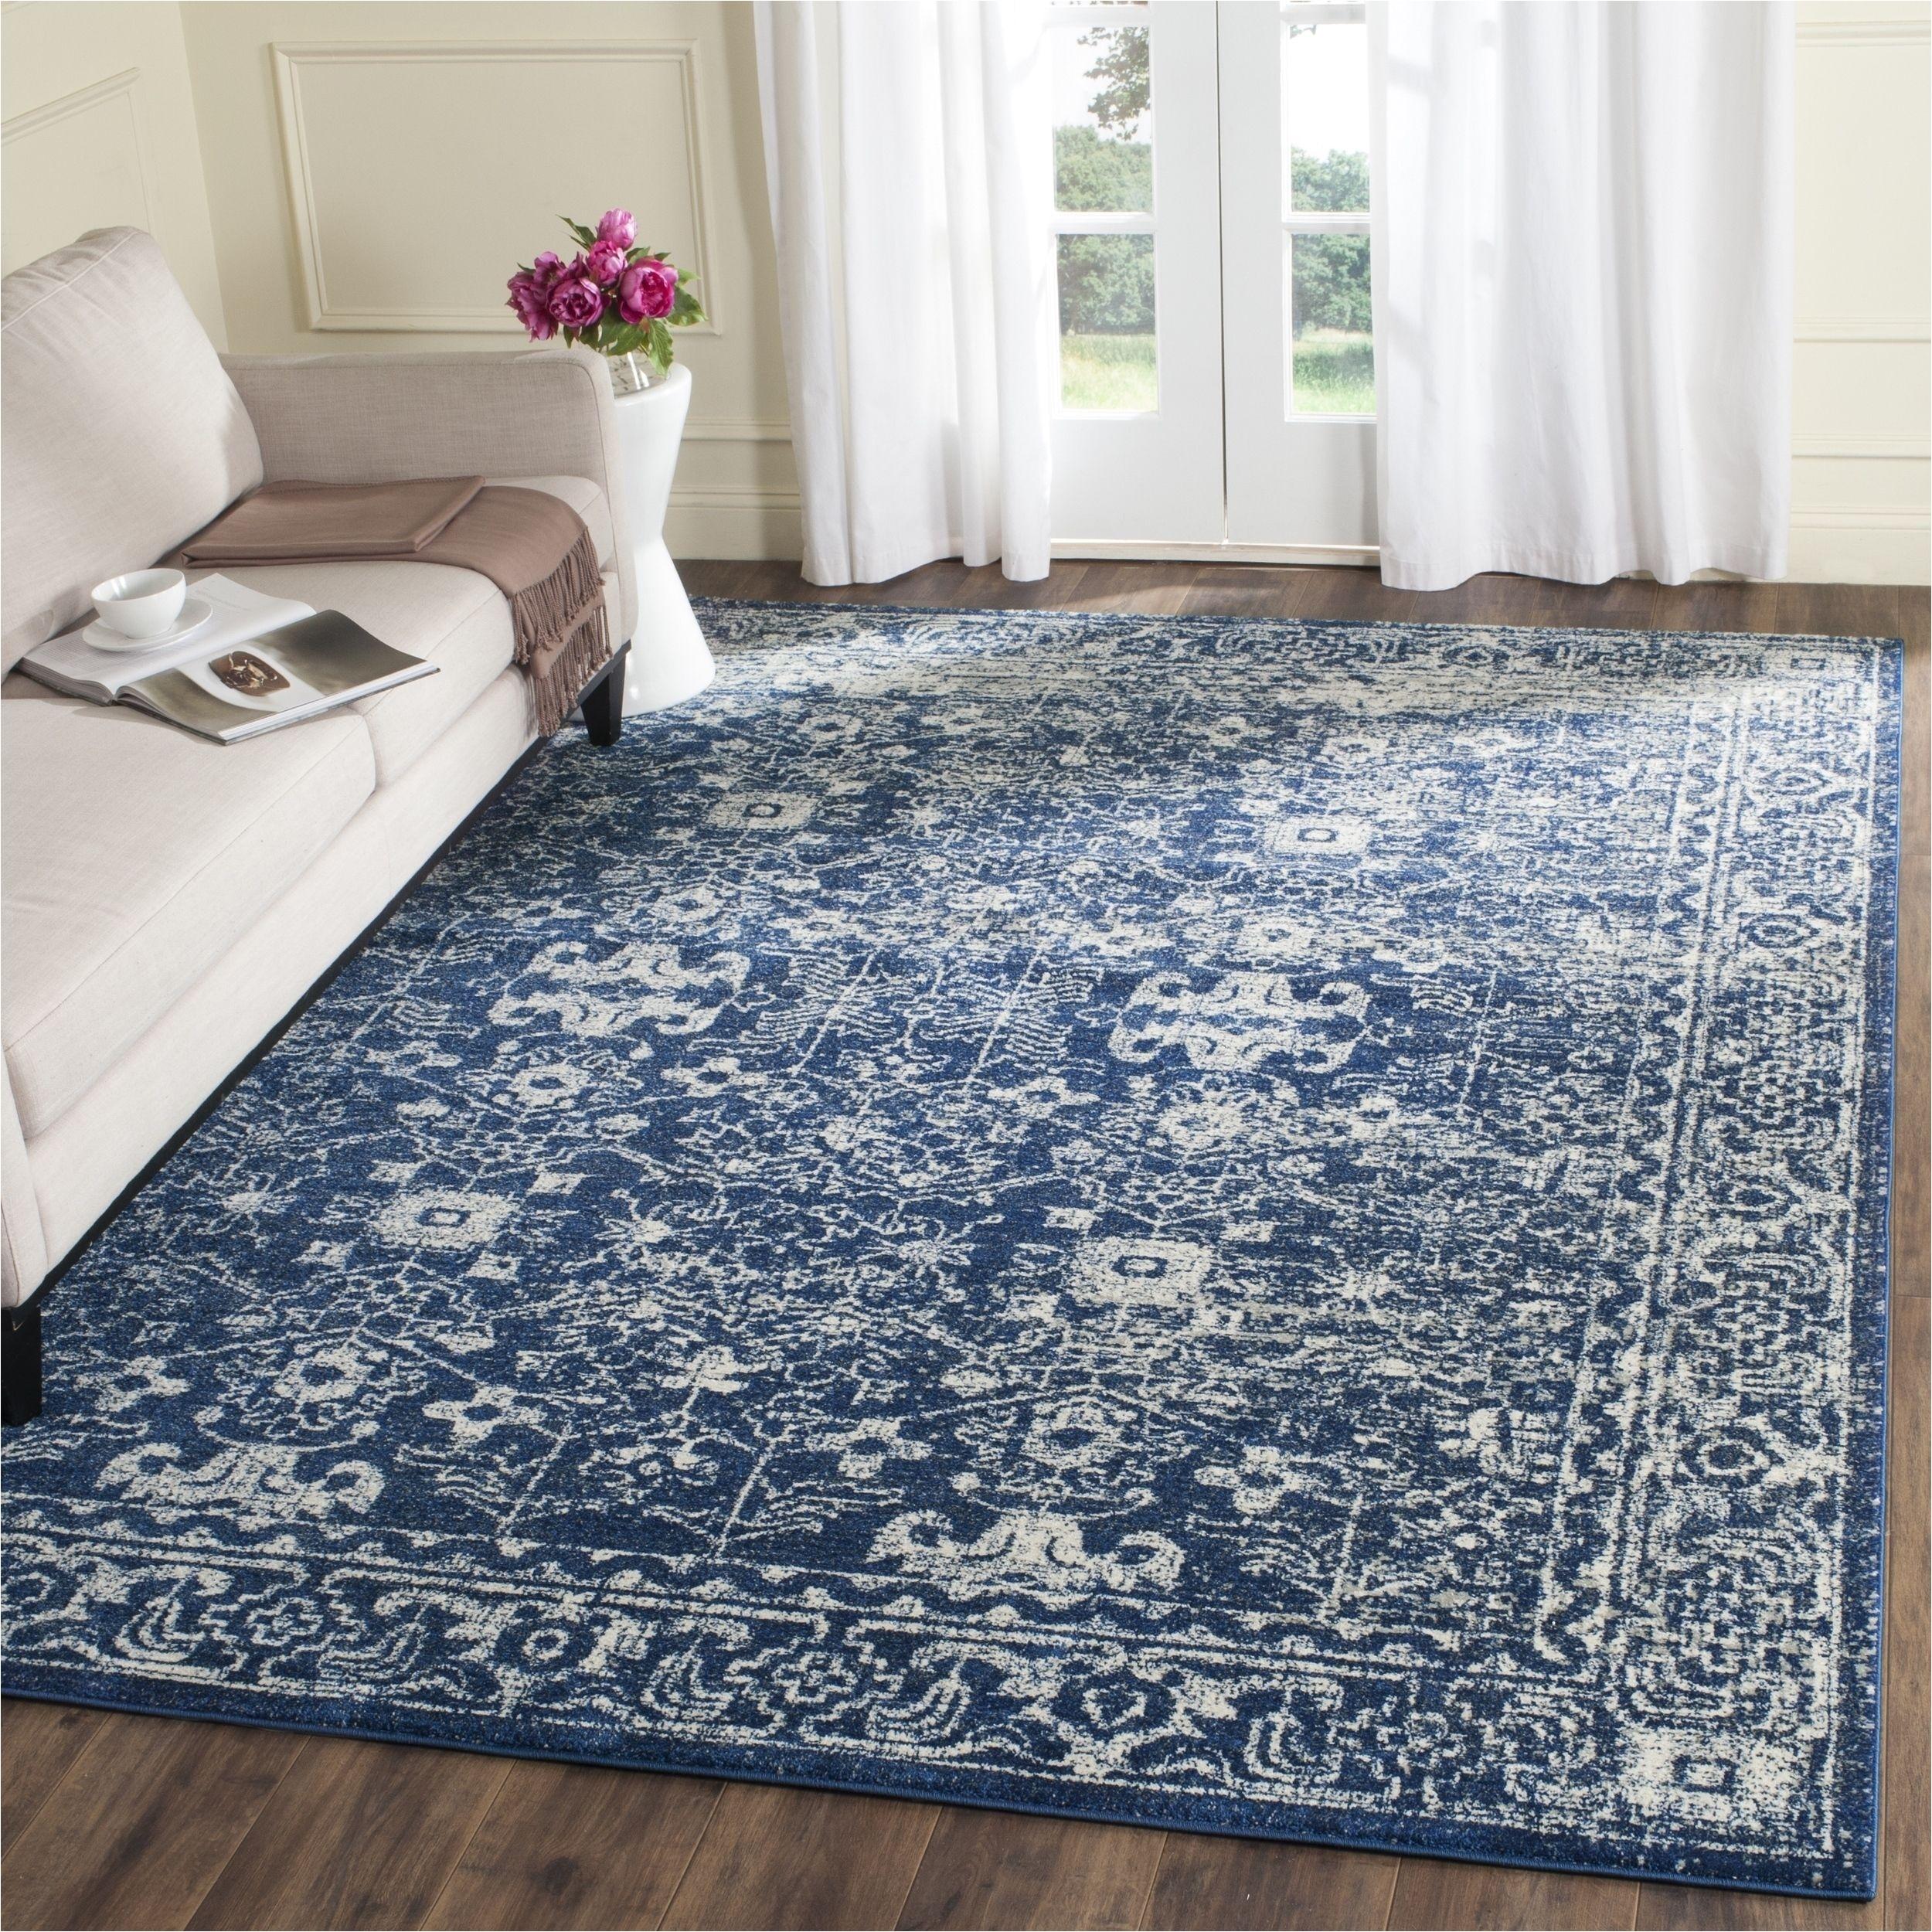 safavieh evoke vintage oriental navy blue ivory distressed rug 6 7 square evk270a 7sq size 6